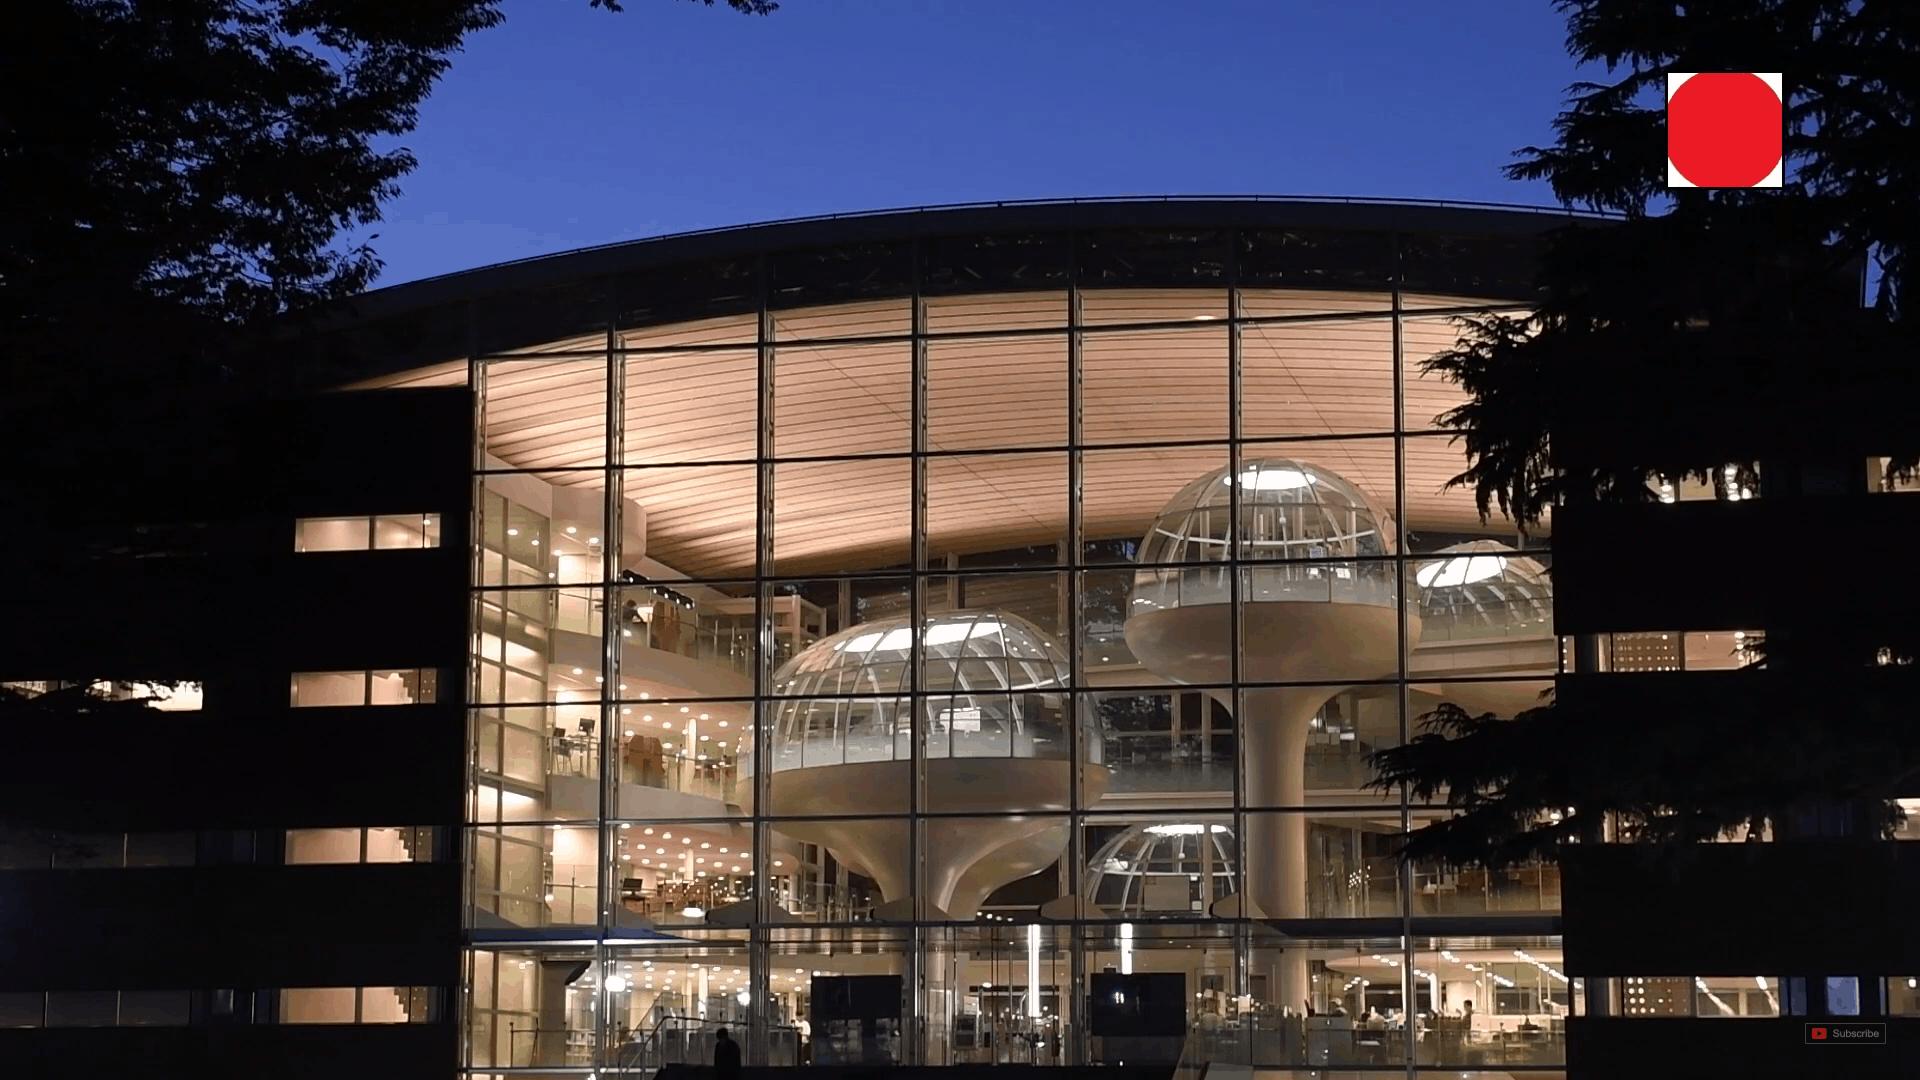 Seikei University Library | Tokyo ห้องสมุด สุดเก๋ใน ญี่ปุ่น